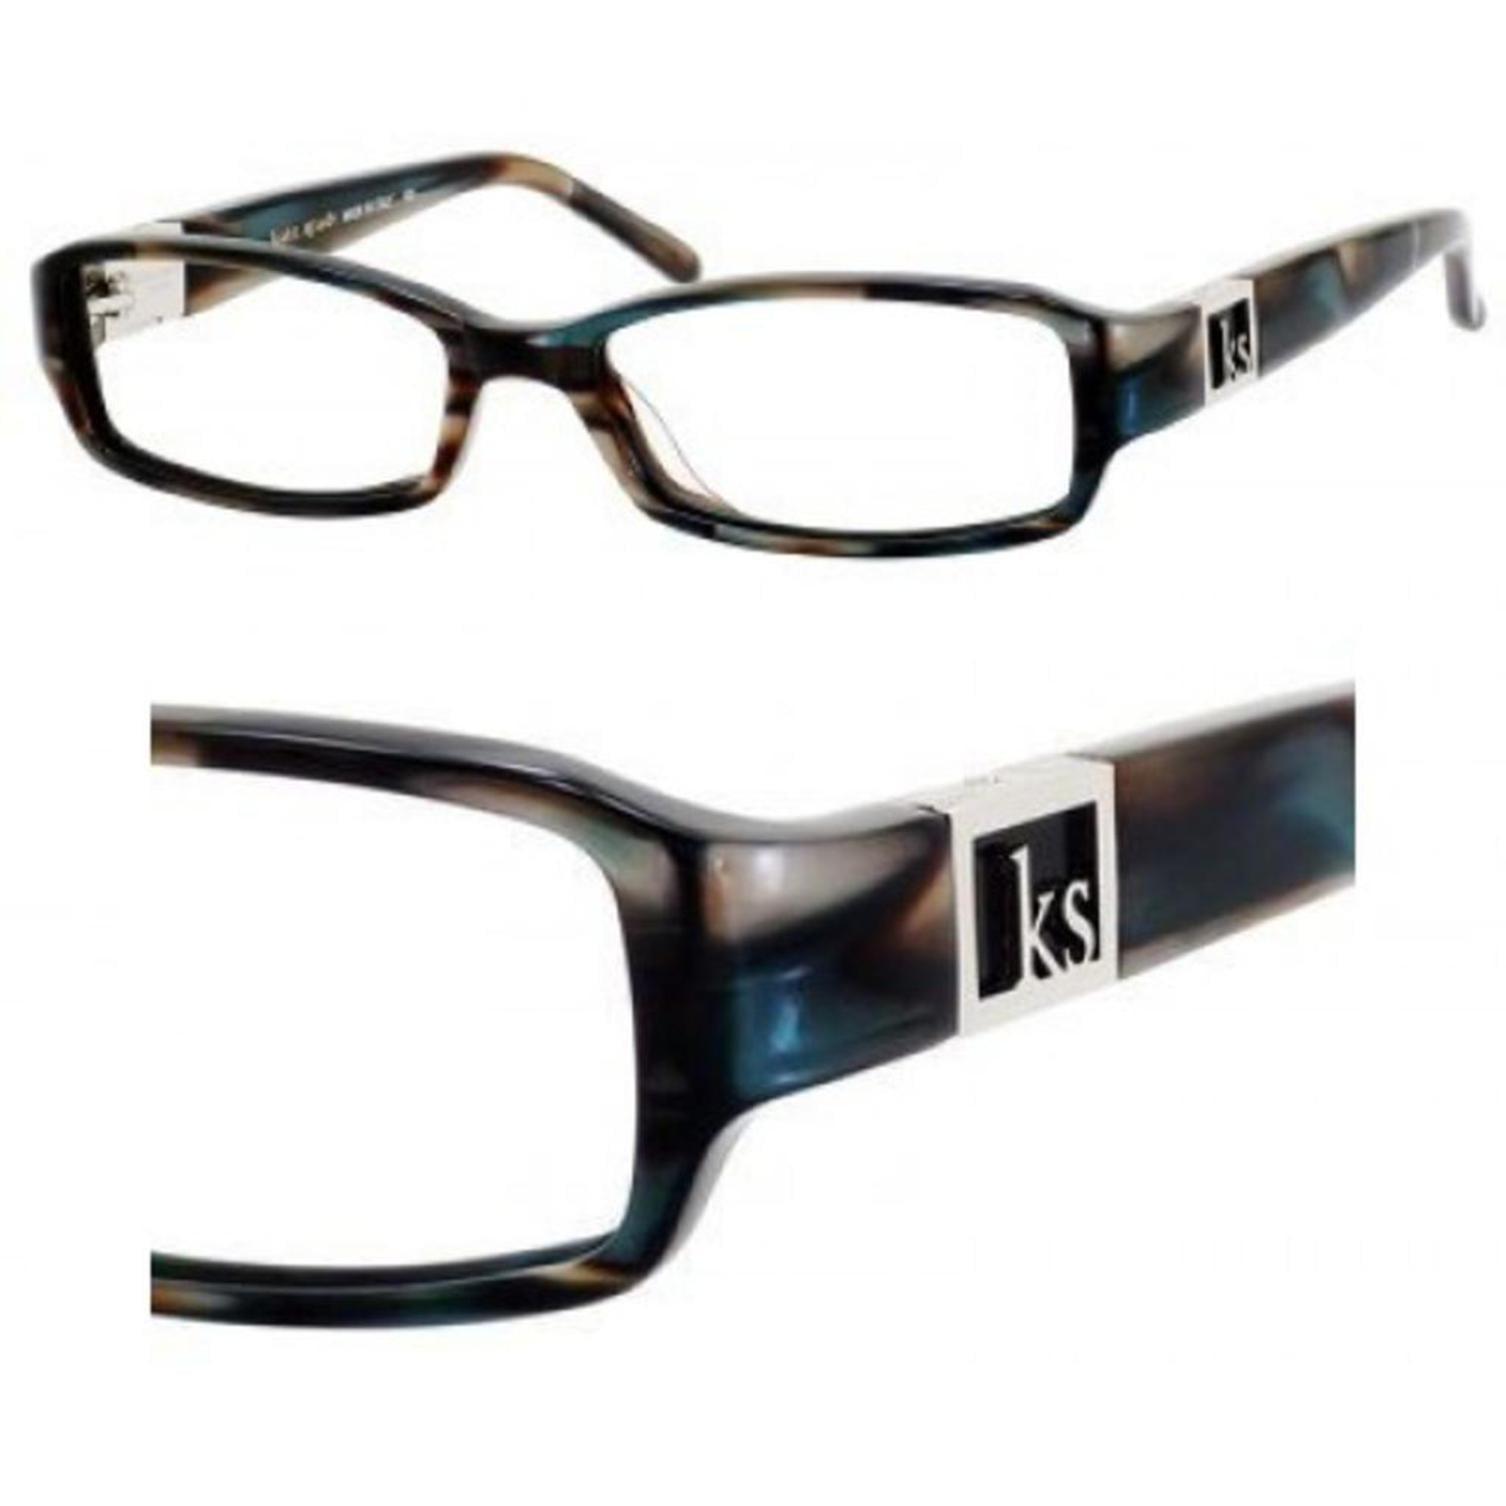 Kate Spade FLORENCE-0IC8-53 Rectangle Womens Abalone Frame Clear Lens Eyeglasses